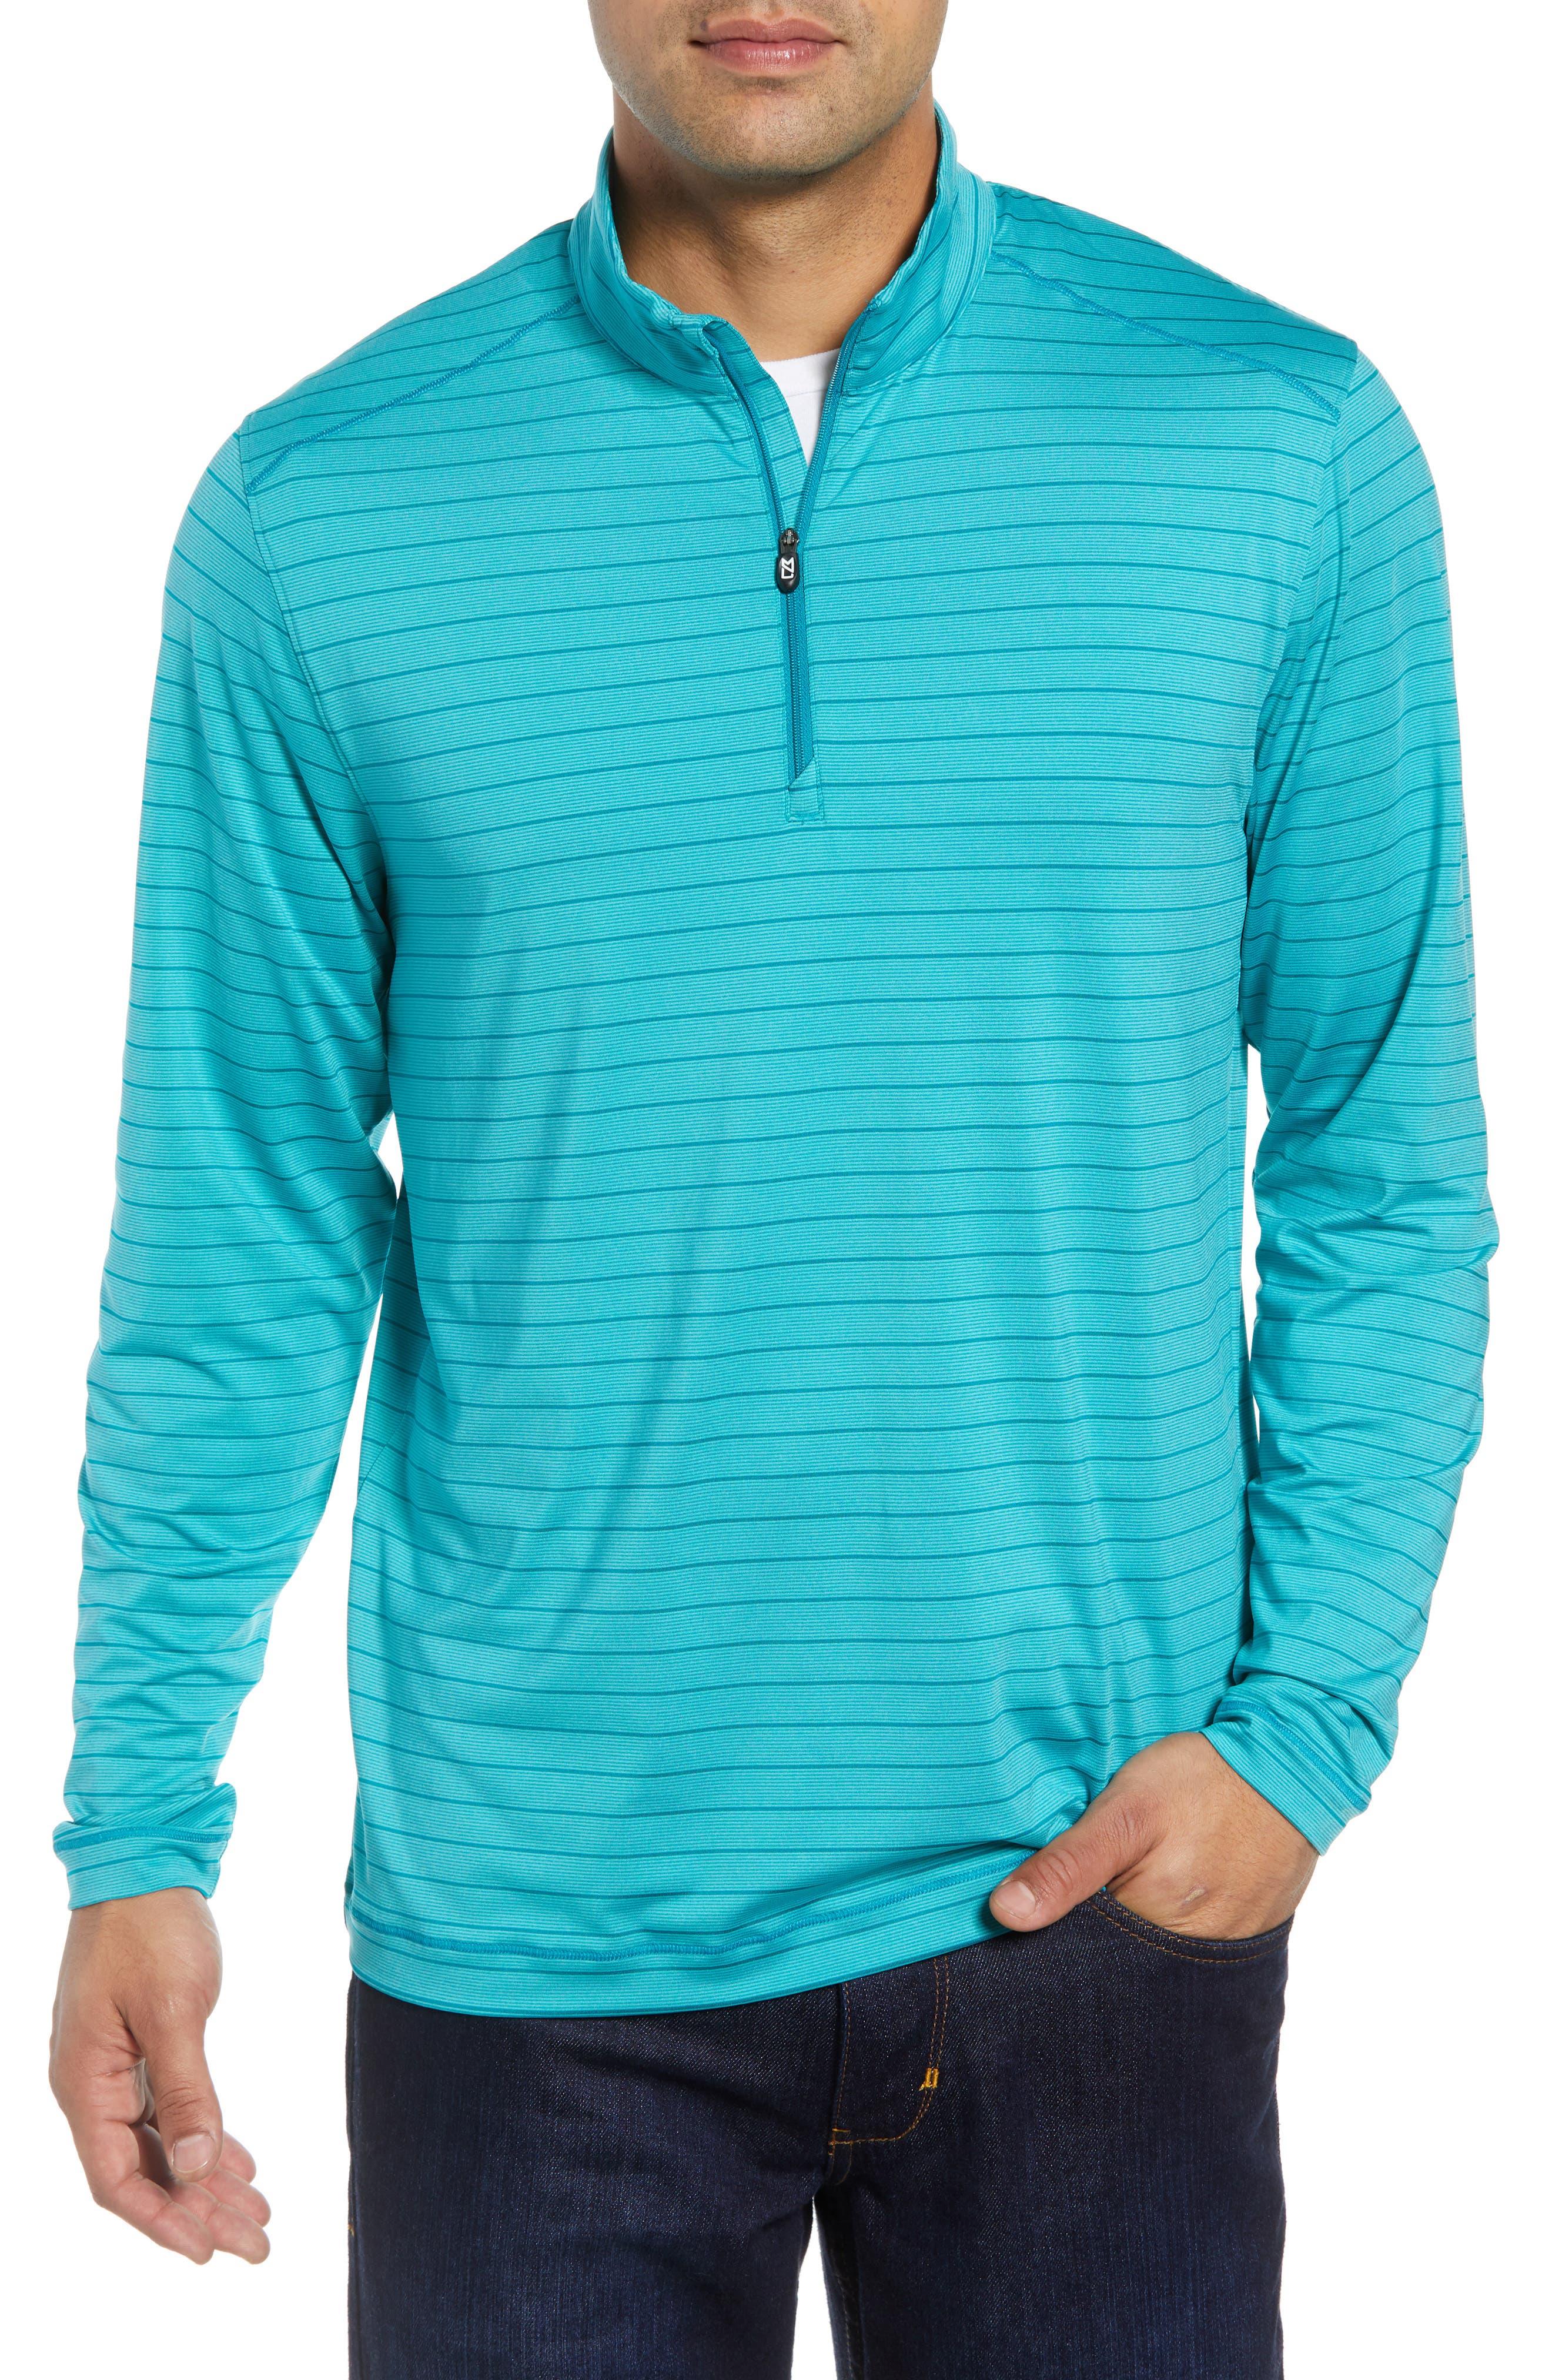 Holman Stripe Half Zip Pullover,                             Main thumbnail 1, color,                             AQUATIC HEATHER